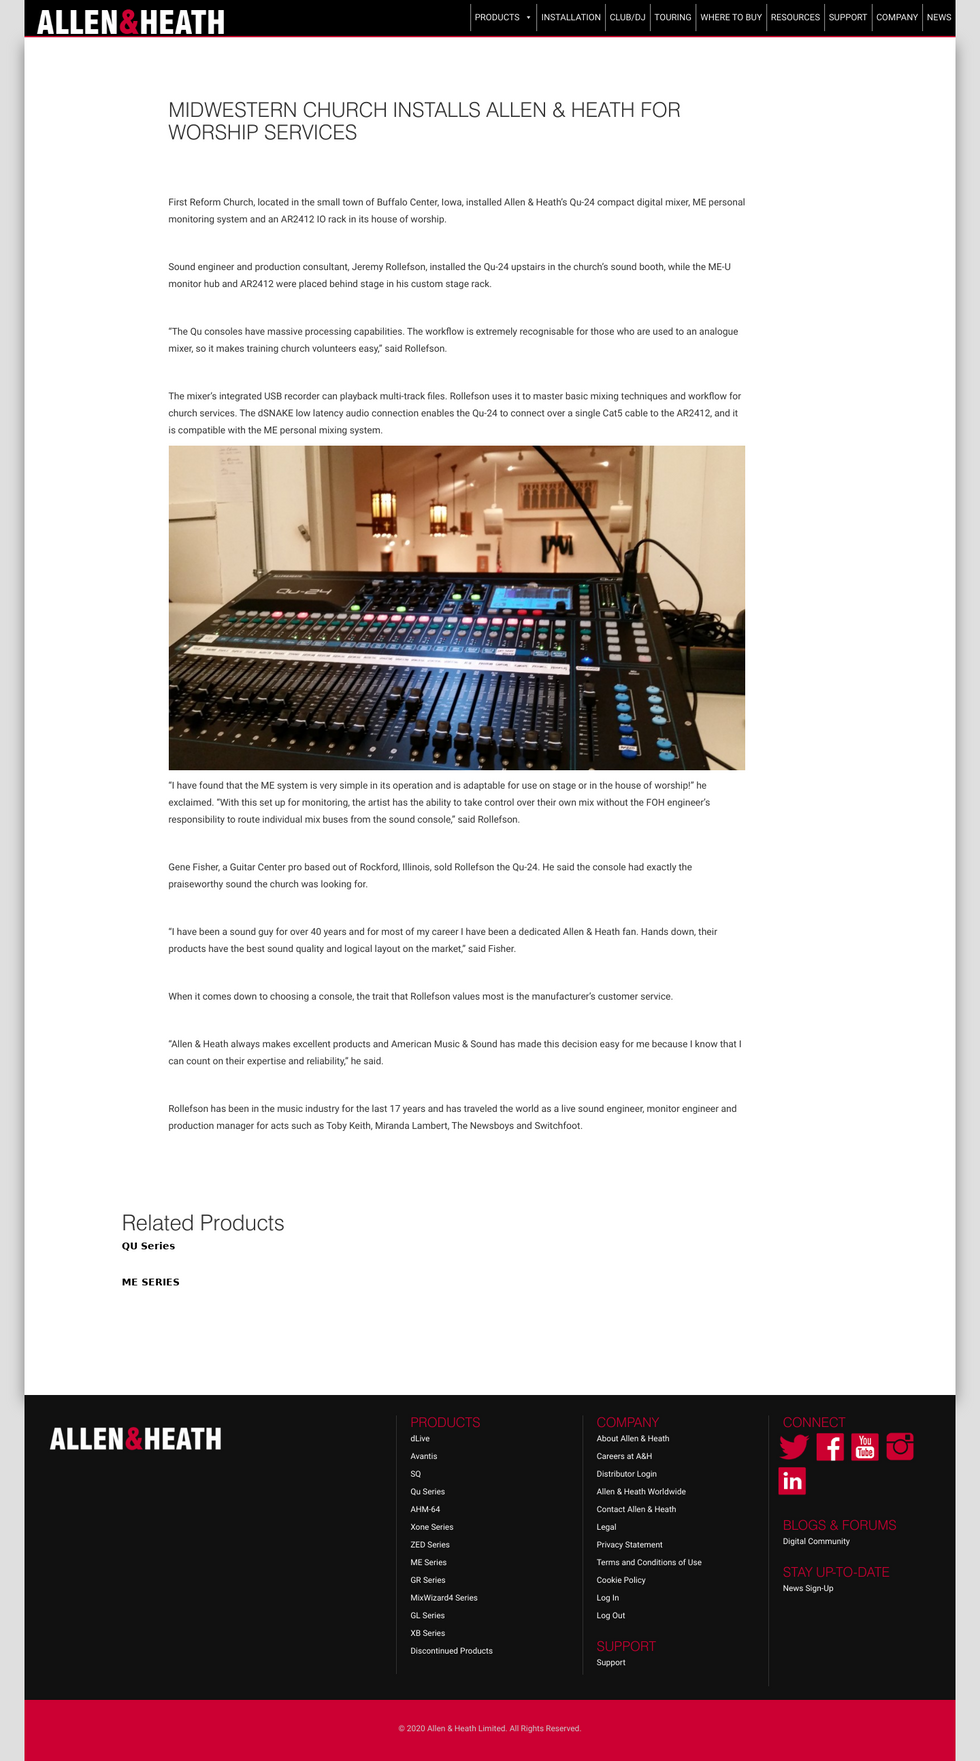 White Train Entertainment: QSC Press Release